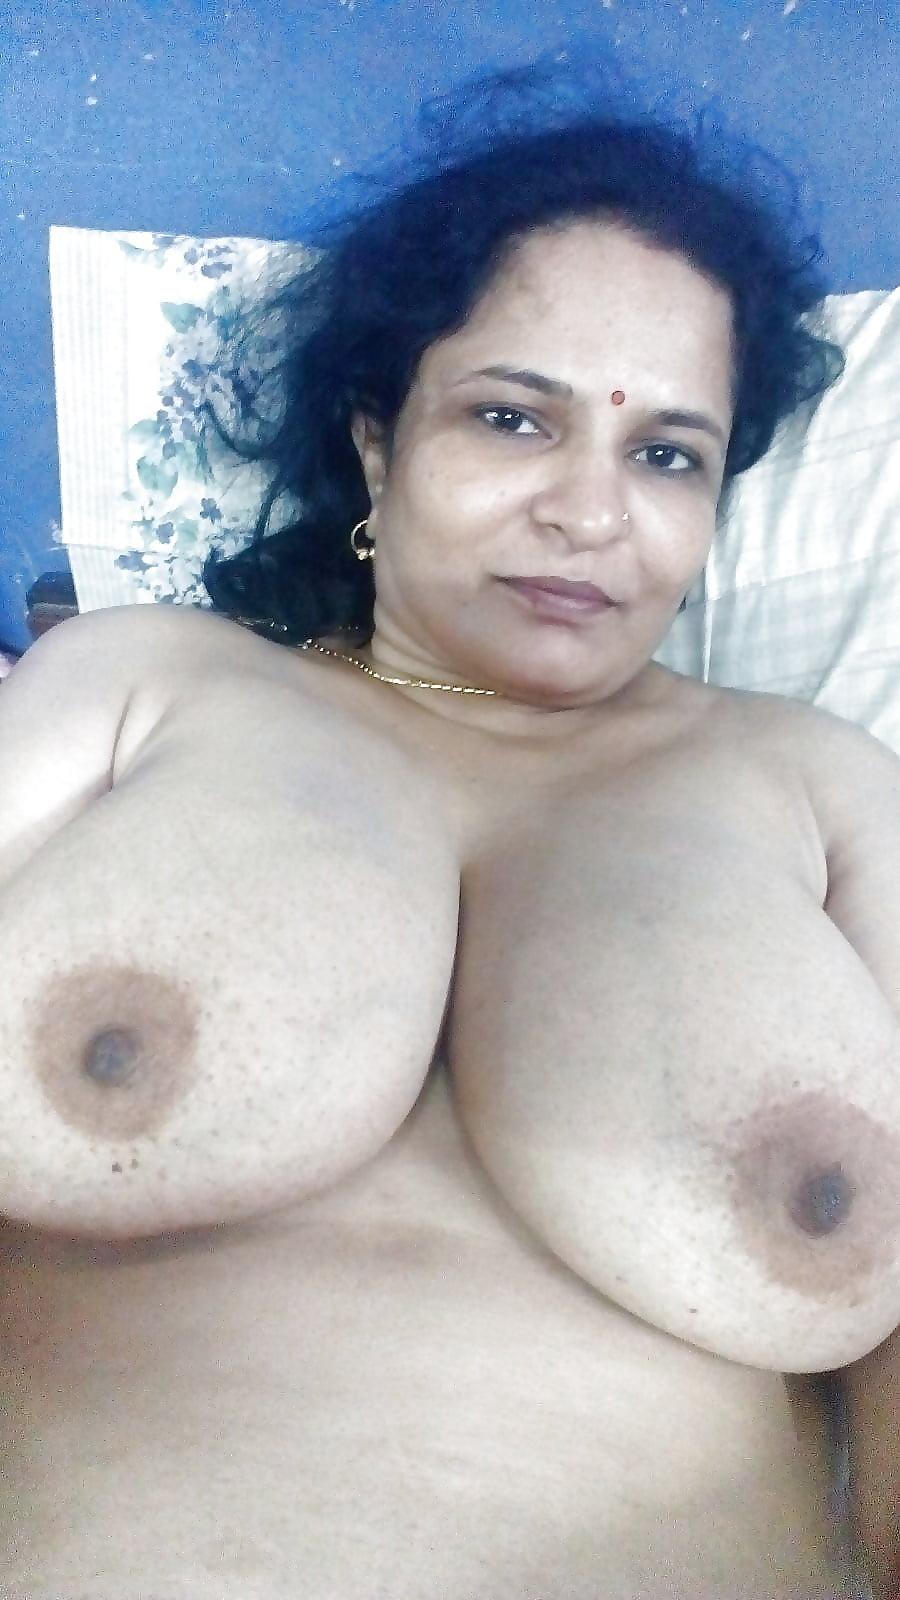 Desi fatty boobs 3